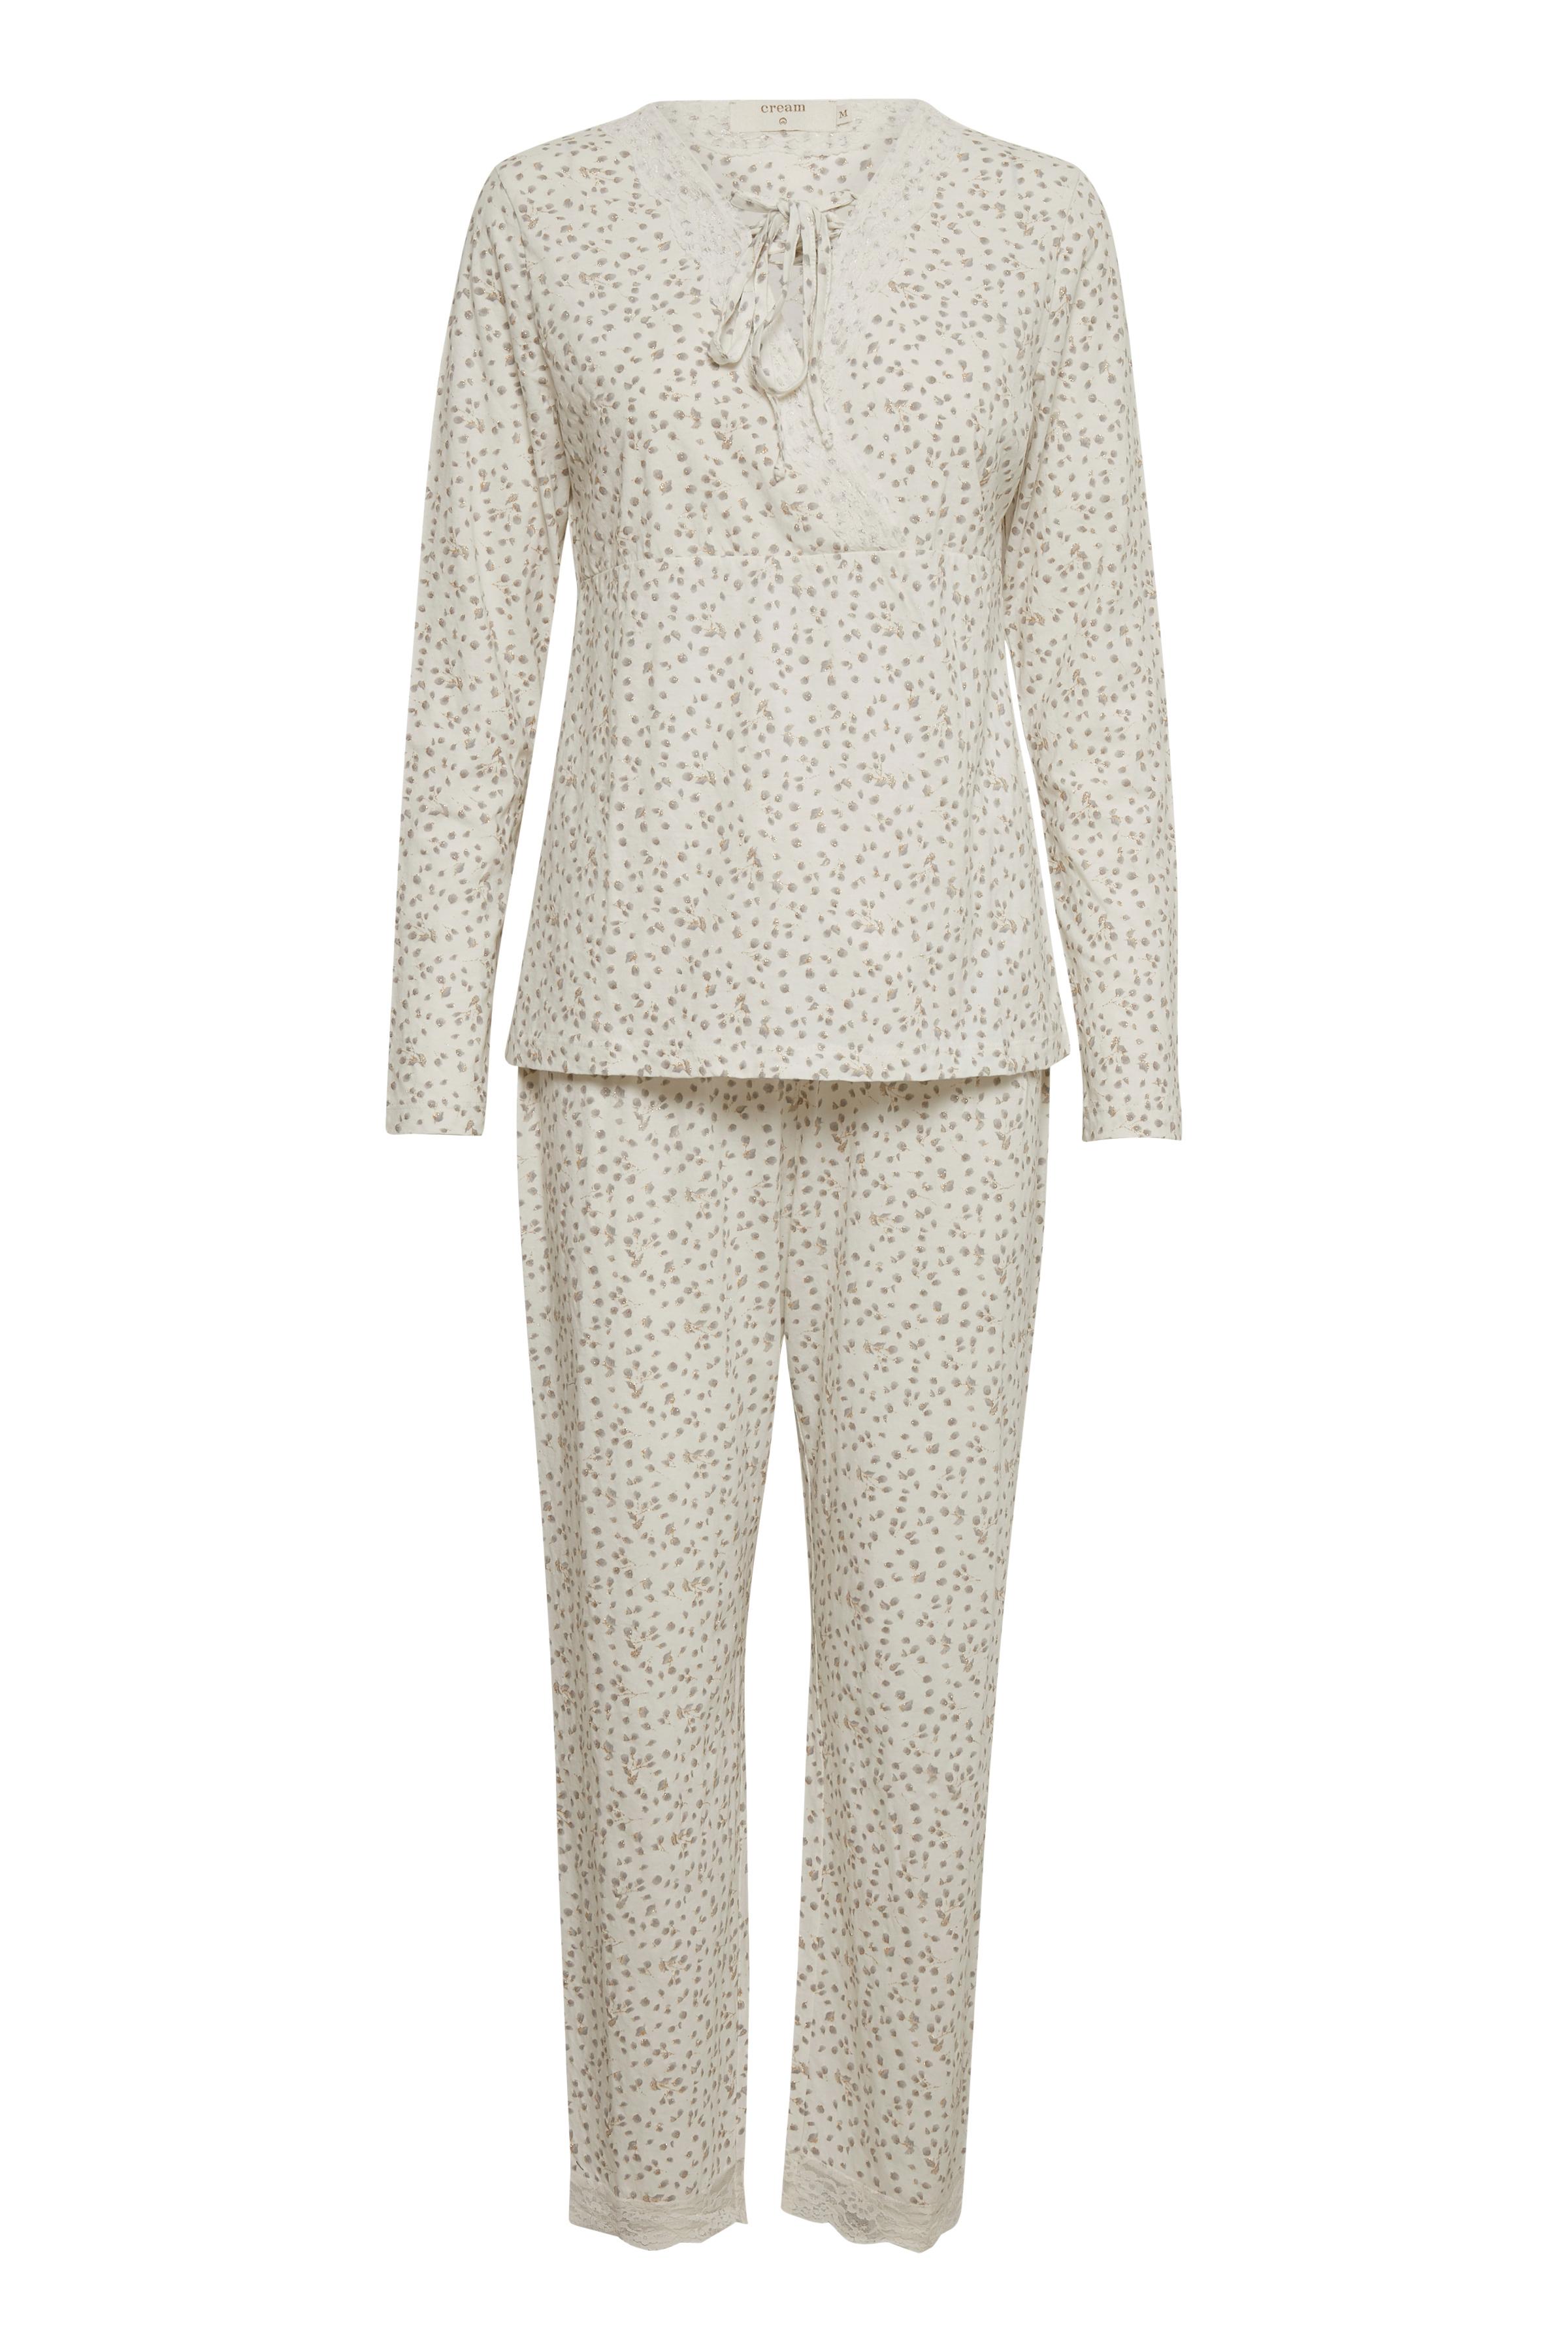 Off-white/sand Nattøj fra Cream Accessories – Køb Off-white/sand Nattøj fra str. XS/S-XL/XXL her